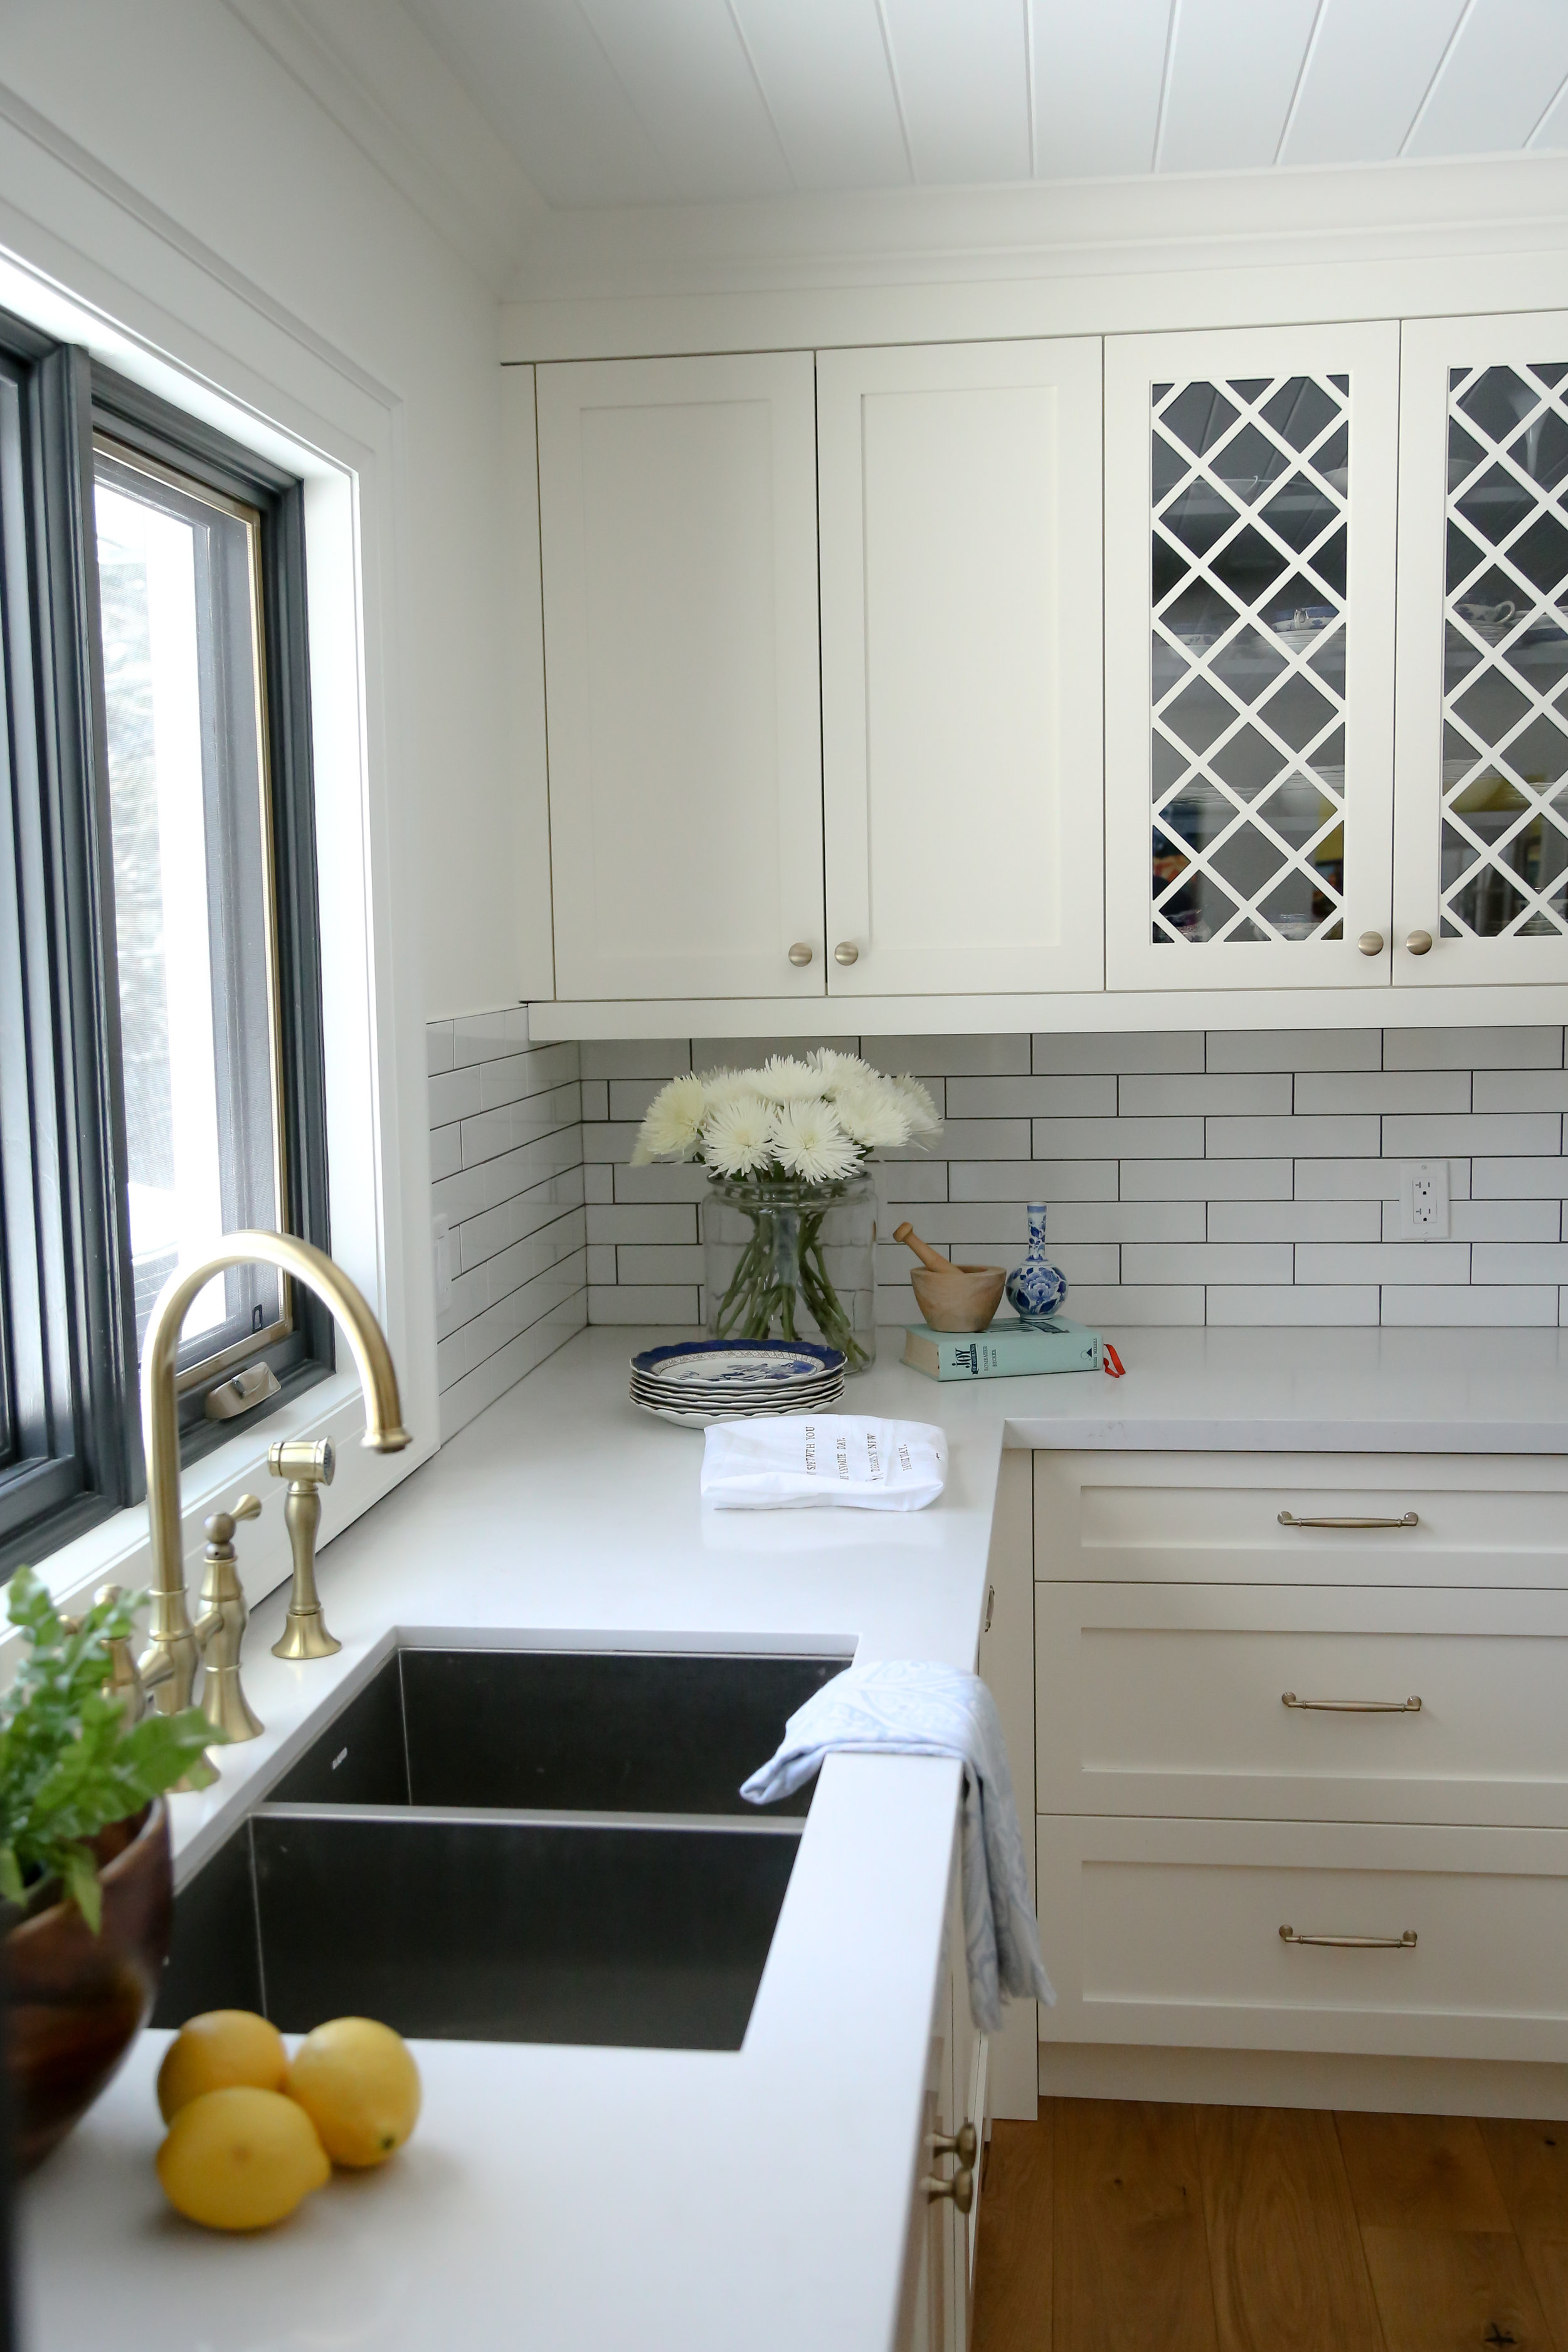 Burnside Cottage kitchen renovation. Courtesy of Kelly Tomlinson Photography.